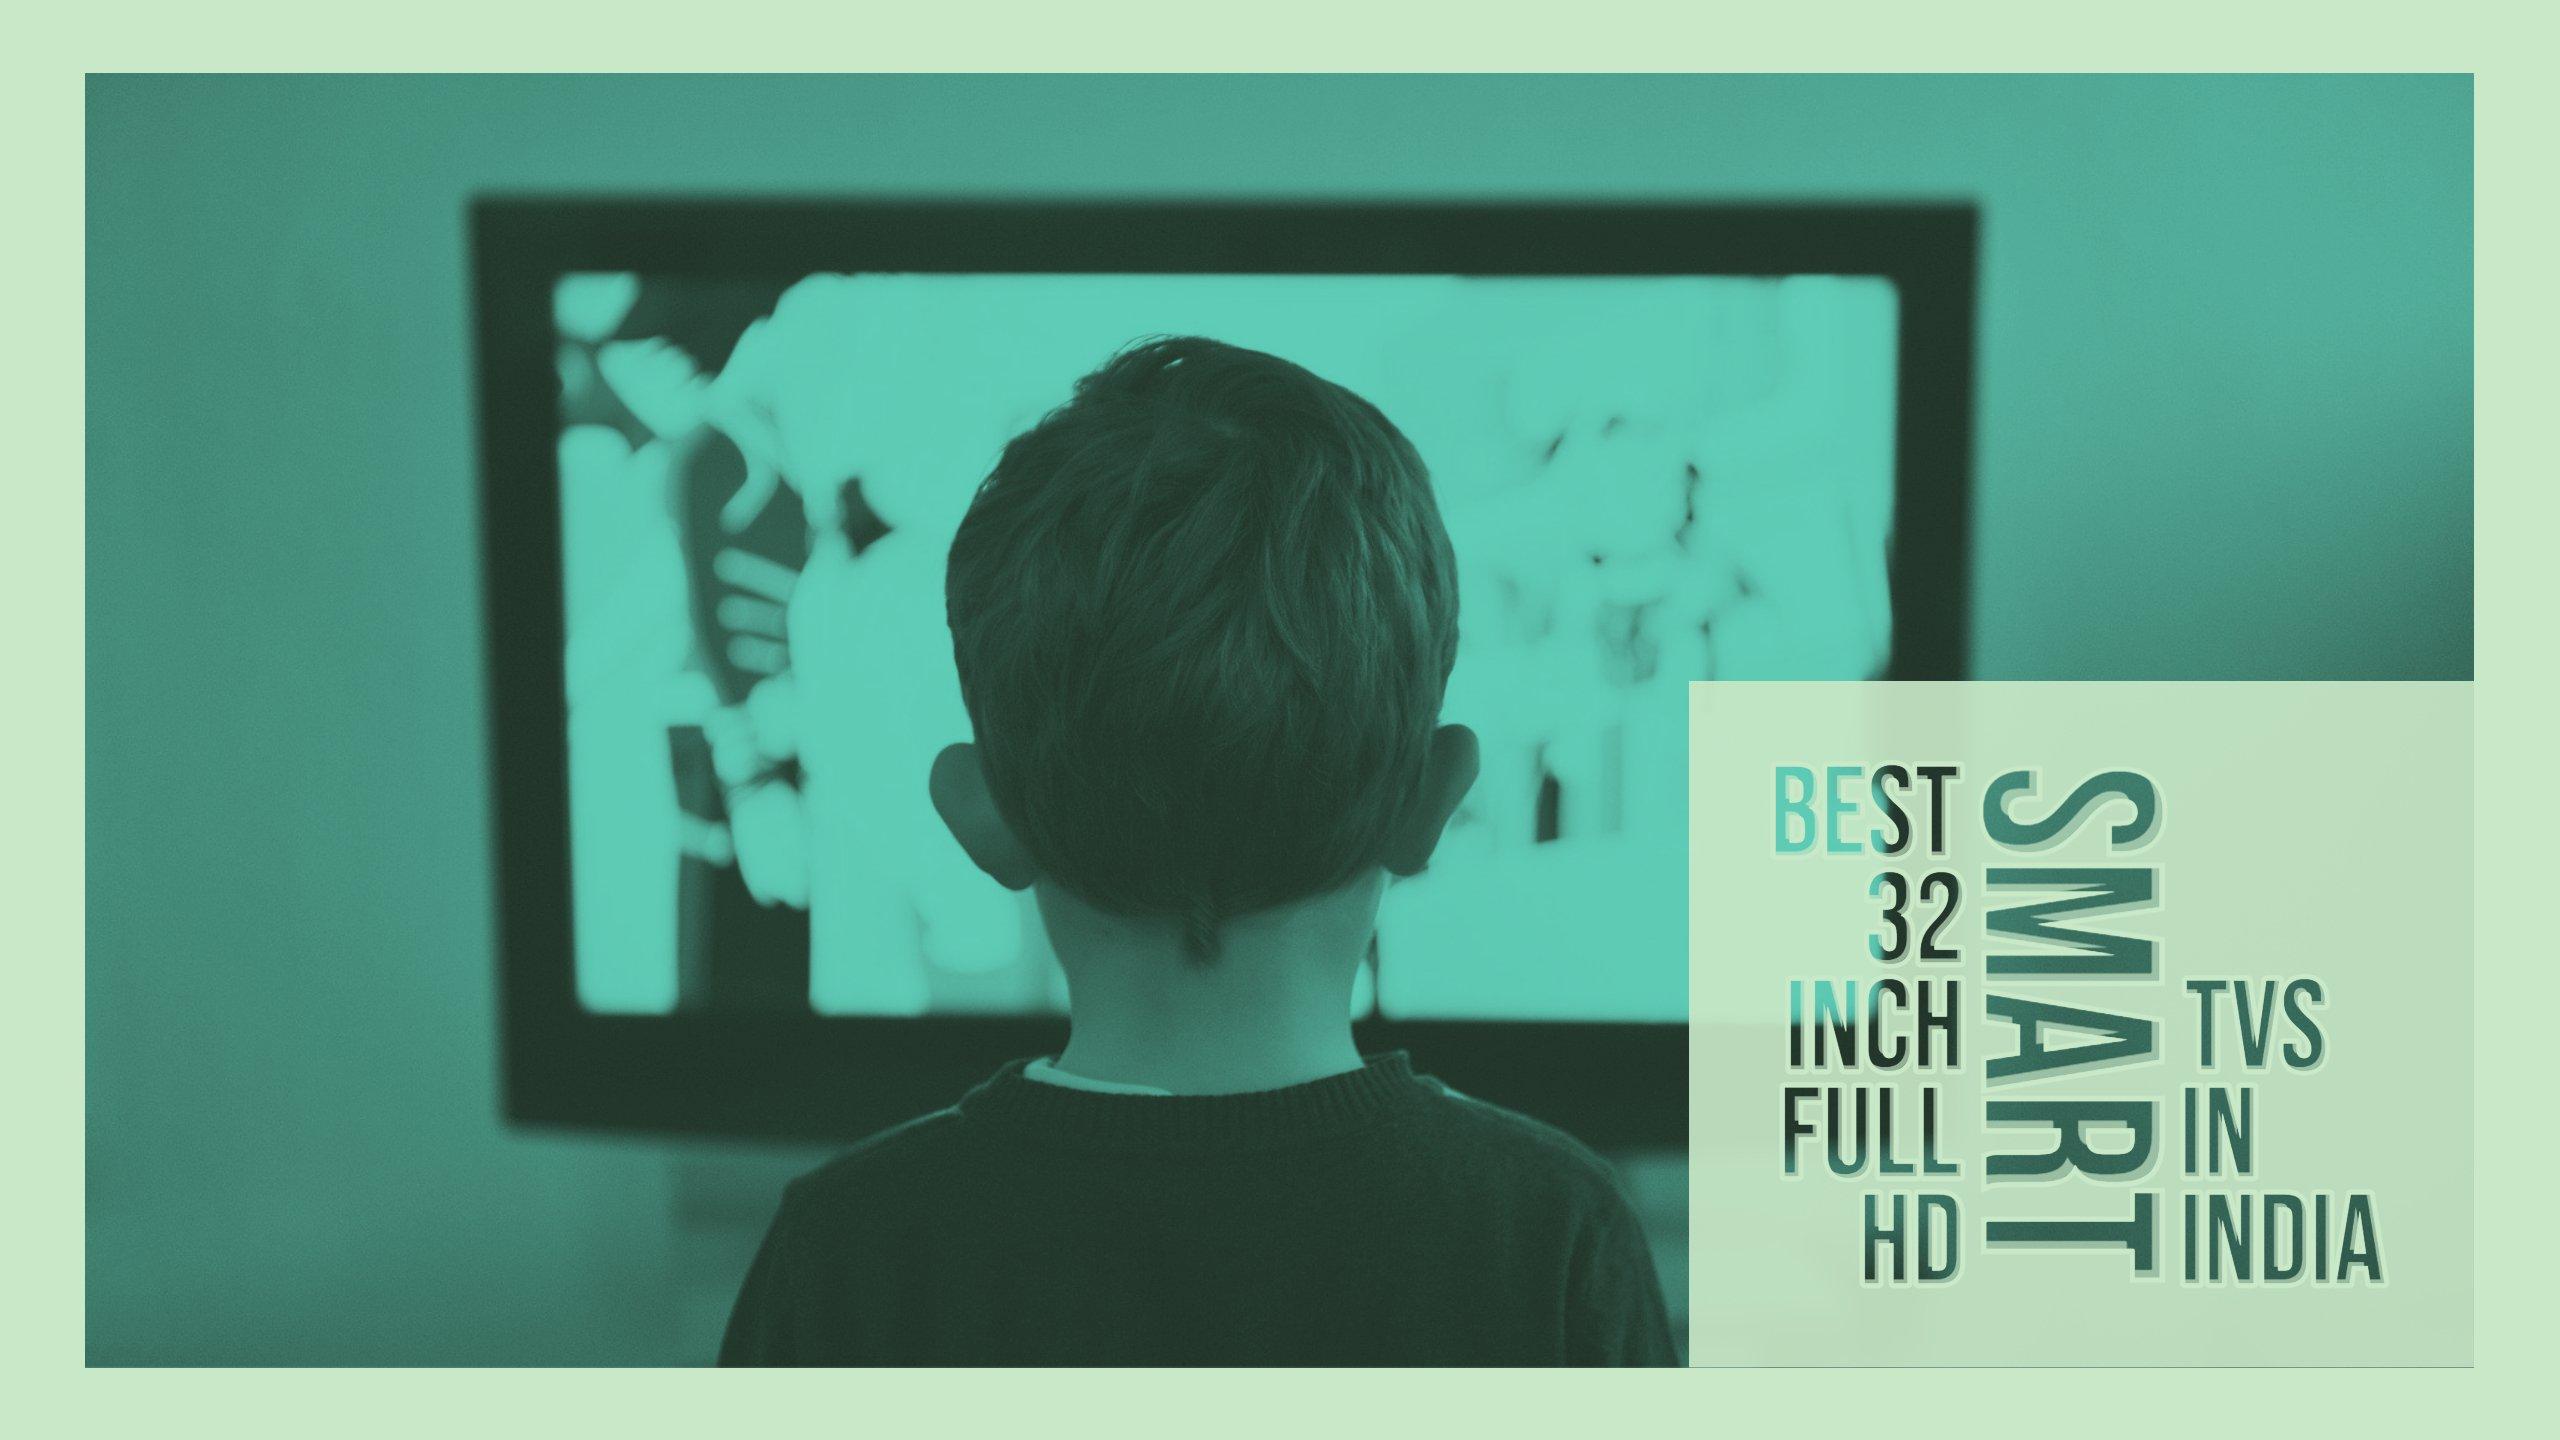 Best 32 inch Full HD smart TVs in India